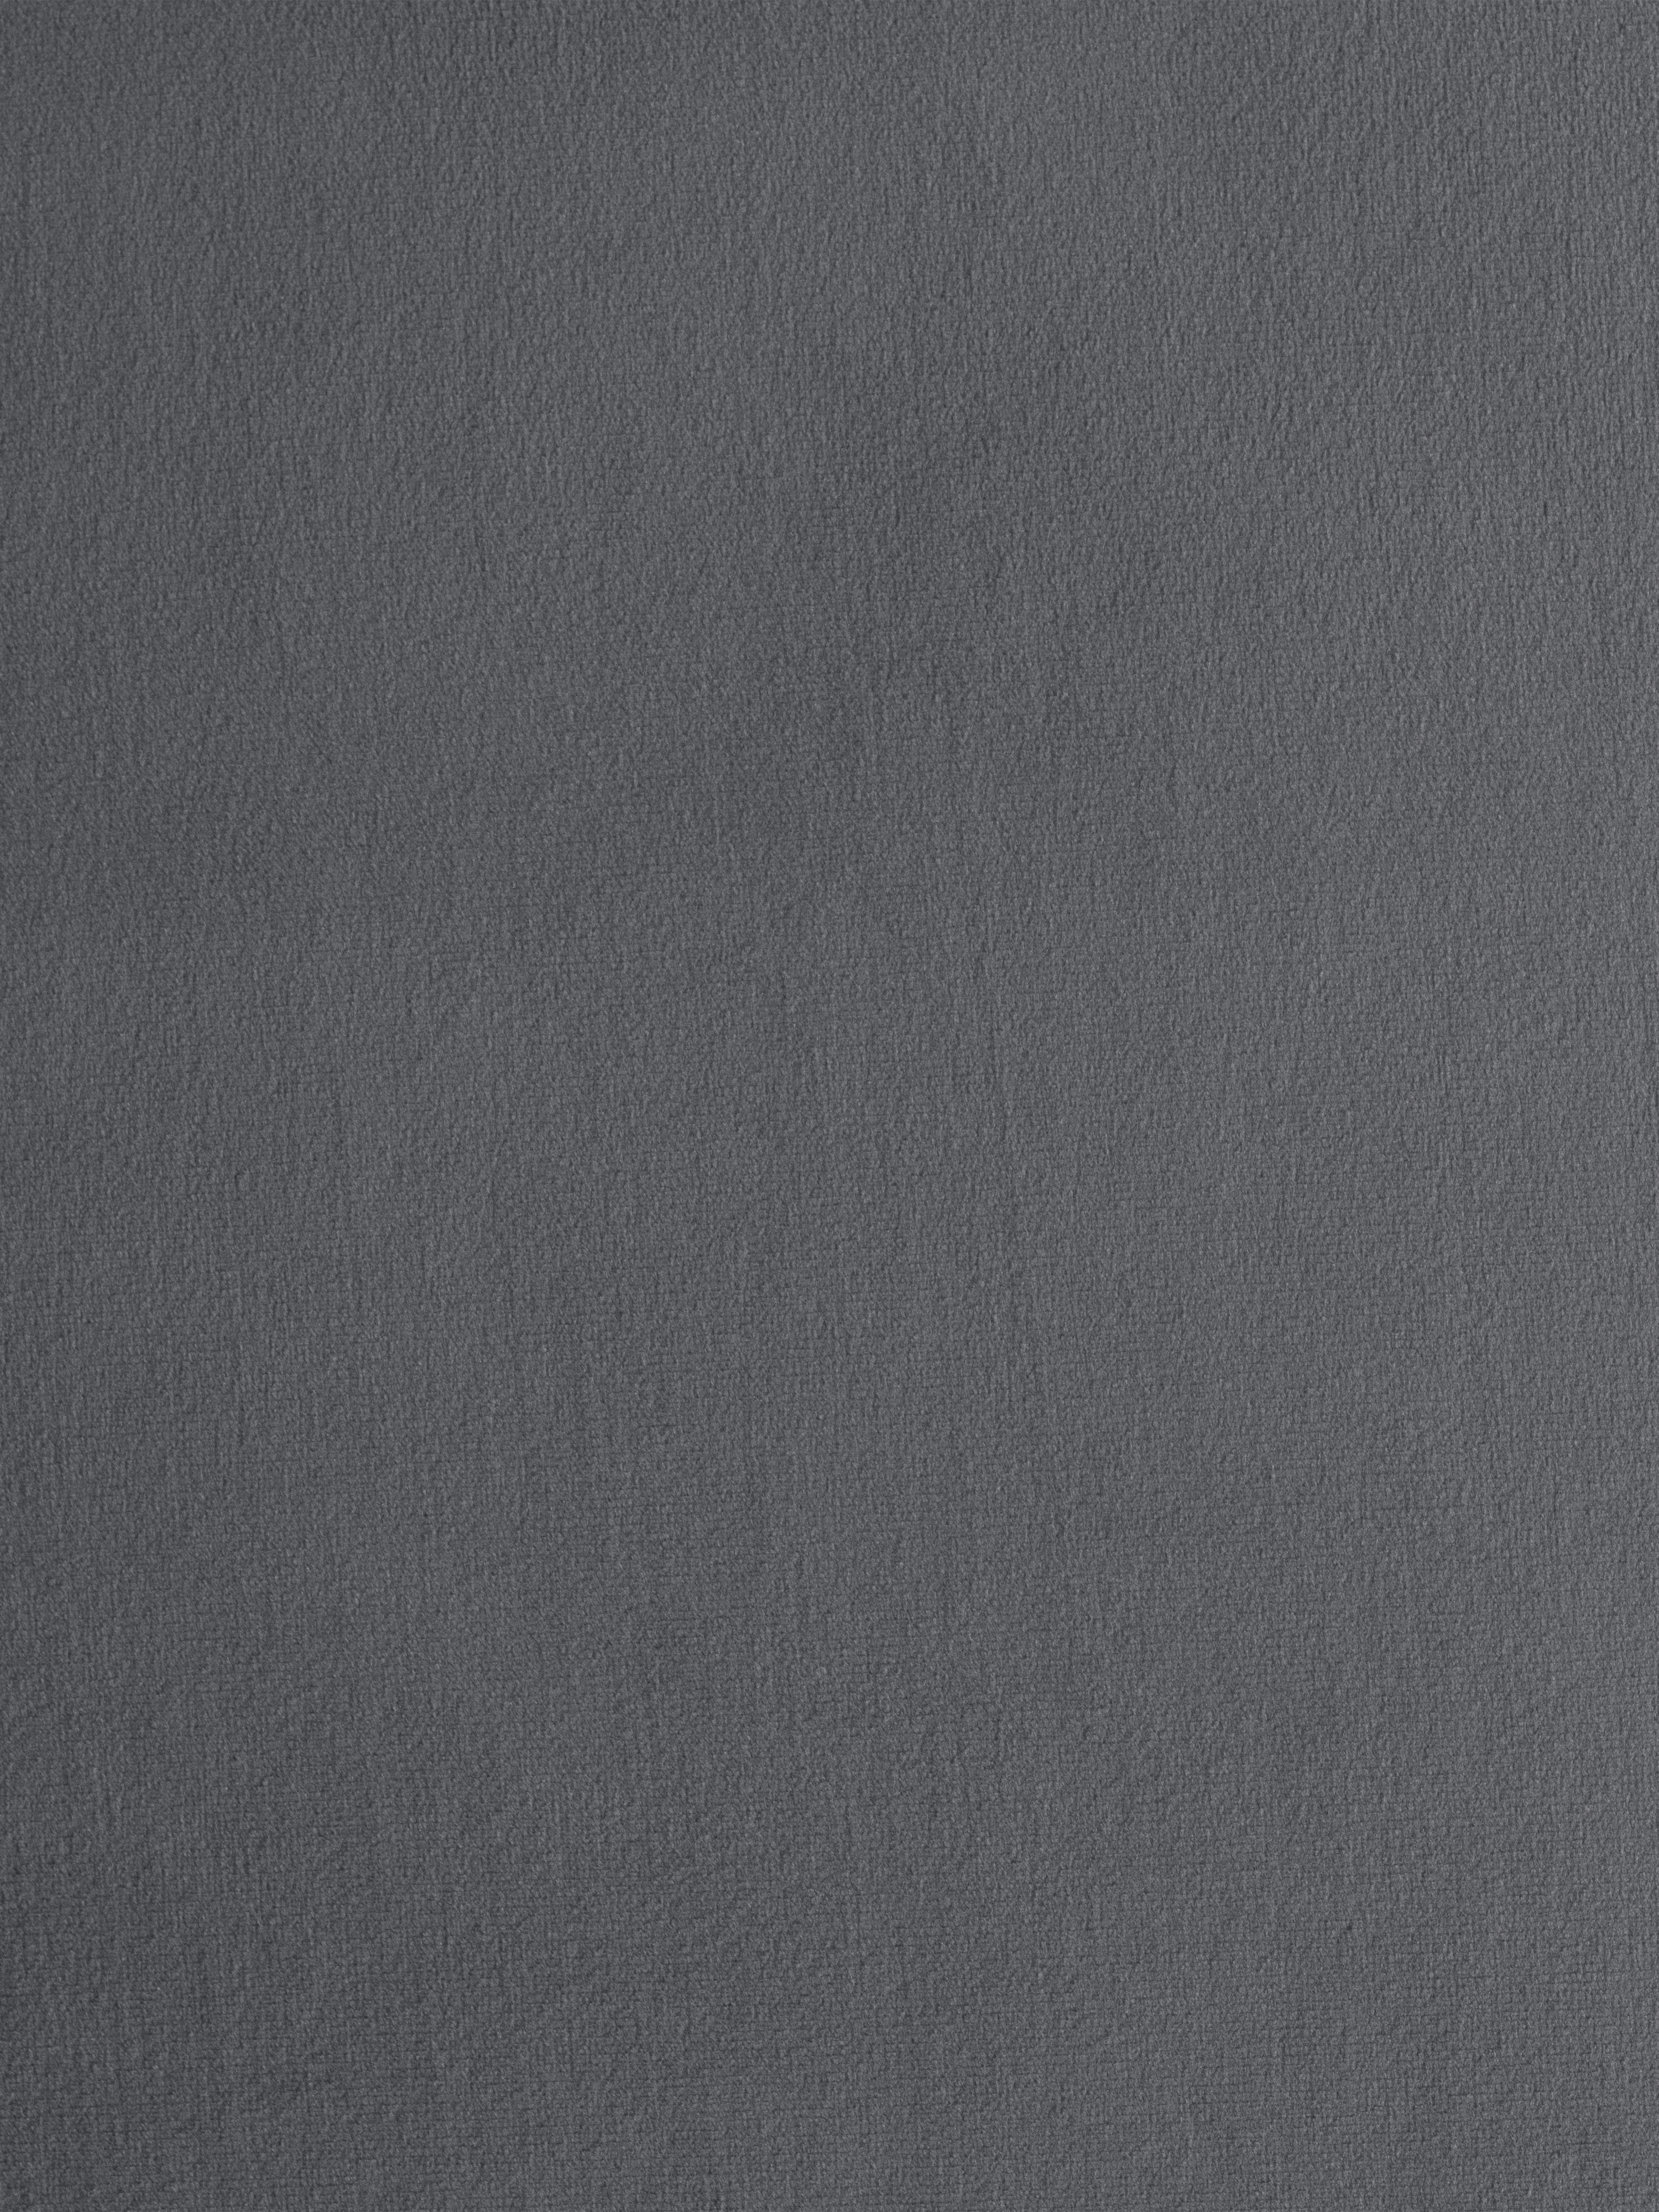 Sofa-Hocker Fluente aus Samt, Bezug: Samt (Hochwertiger Polyes, Gestell: Massives Kiefernholz, Samt Braungrau, 62 x 46 cm